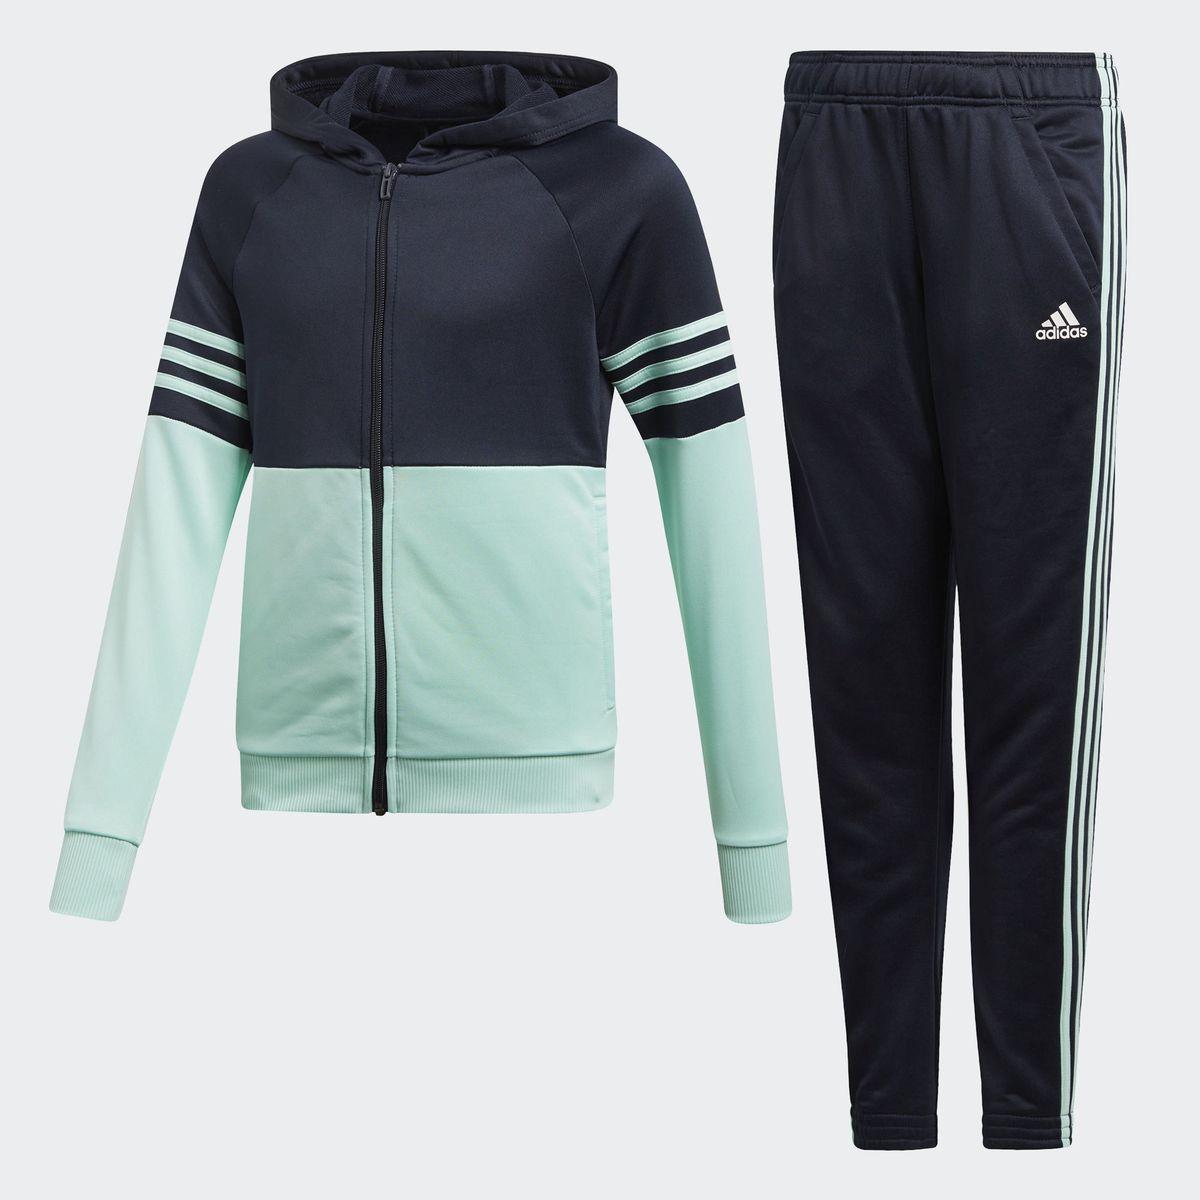 550b1fda6a26 Спортивный костюм adidas